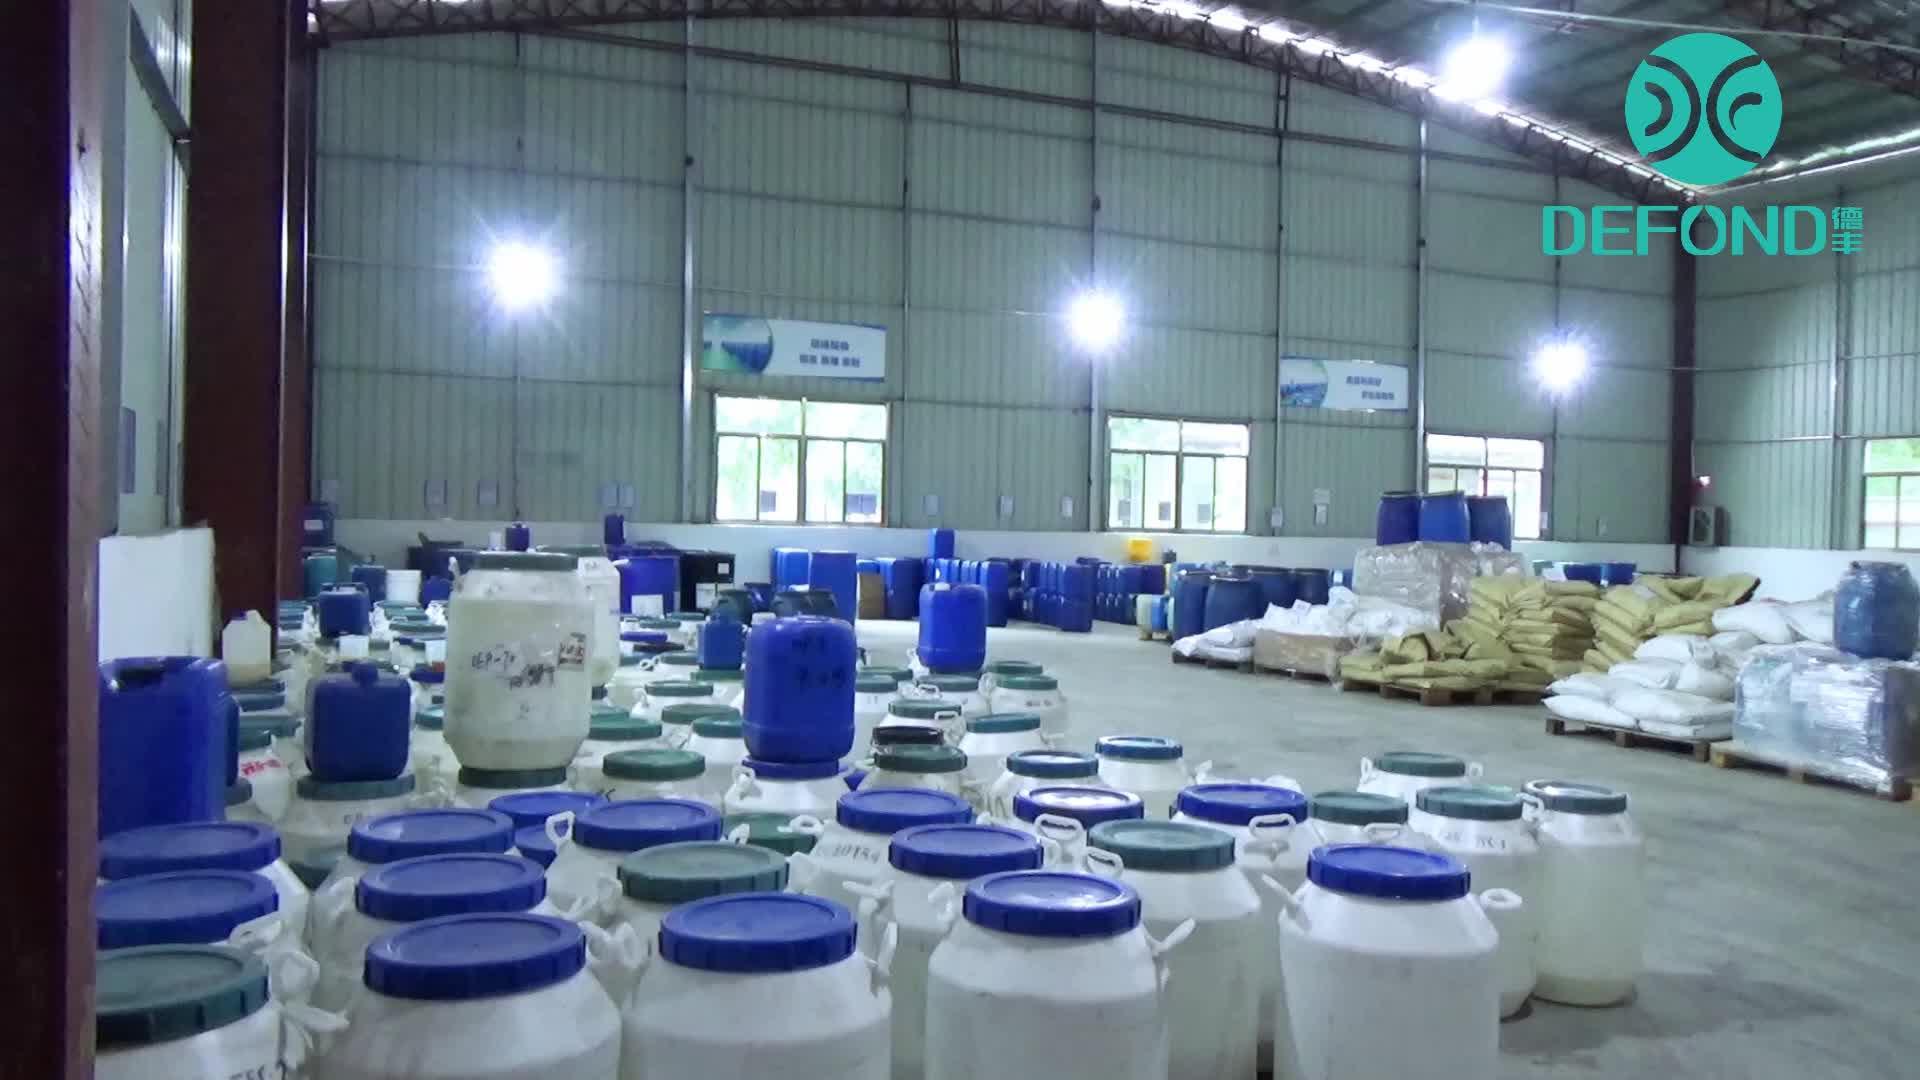 industrial washing scrubbing alkaline cleaning defoaming powder